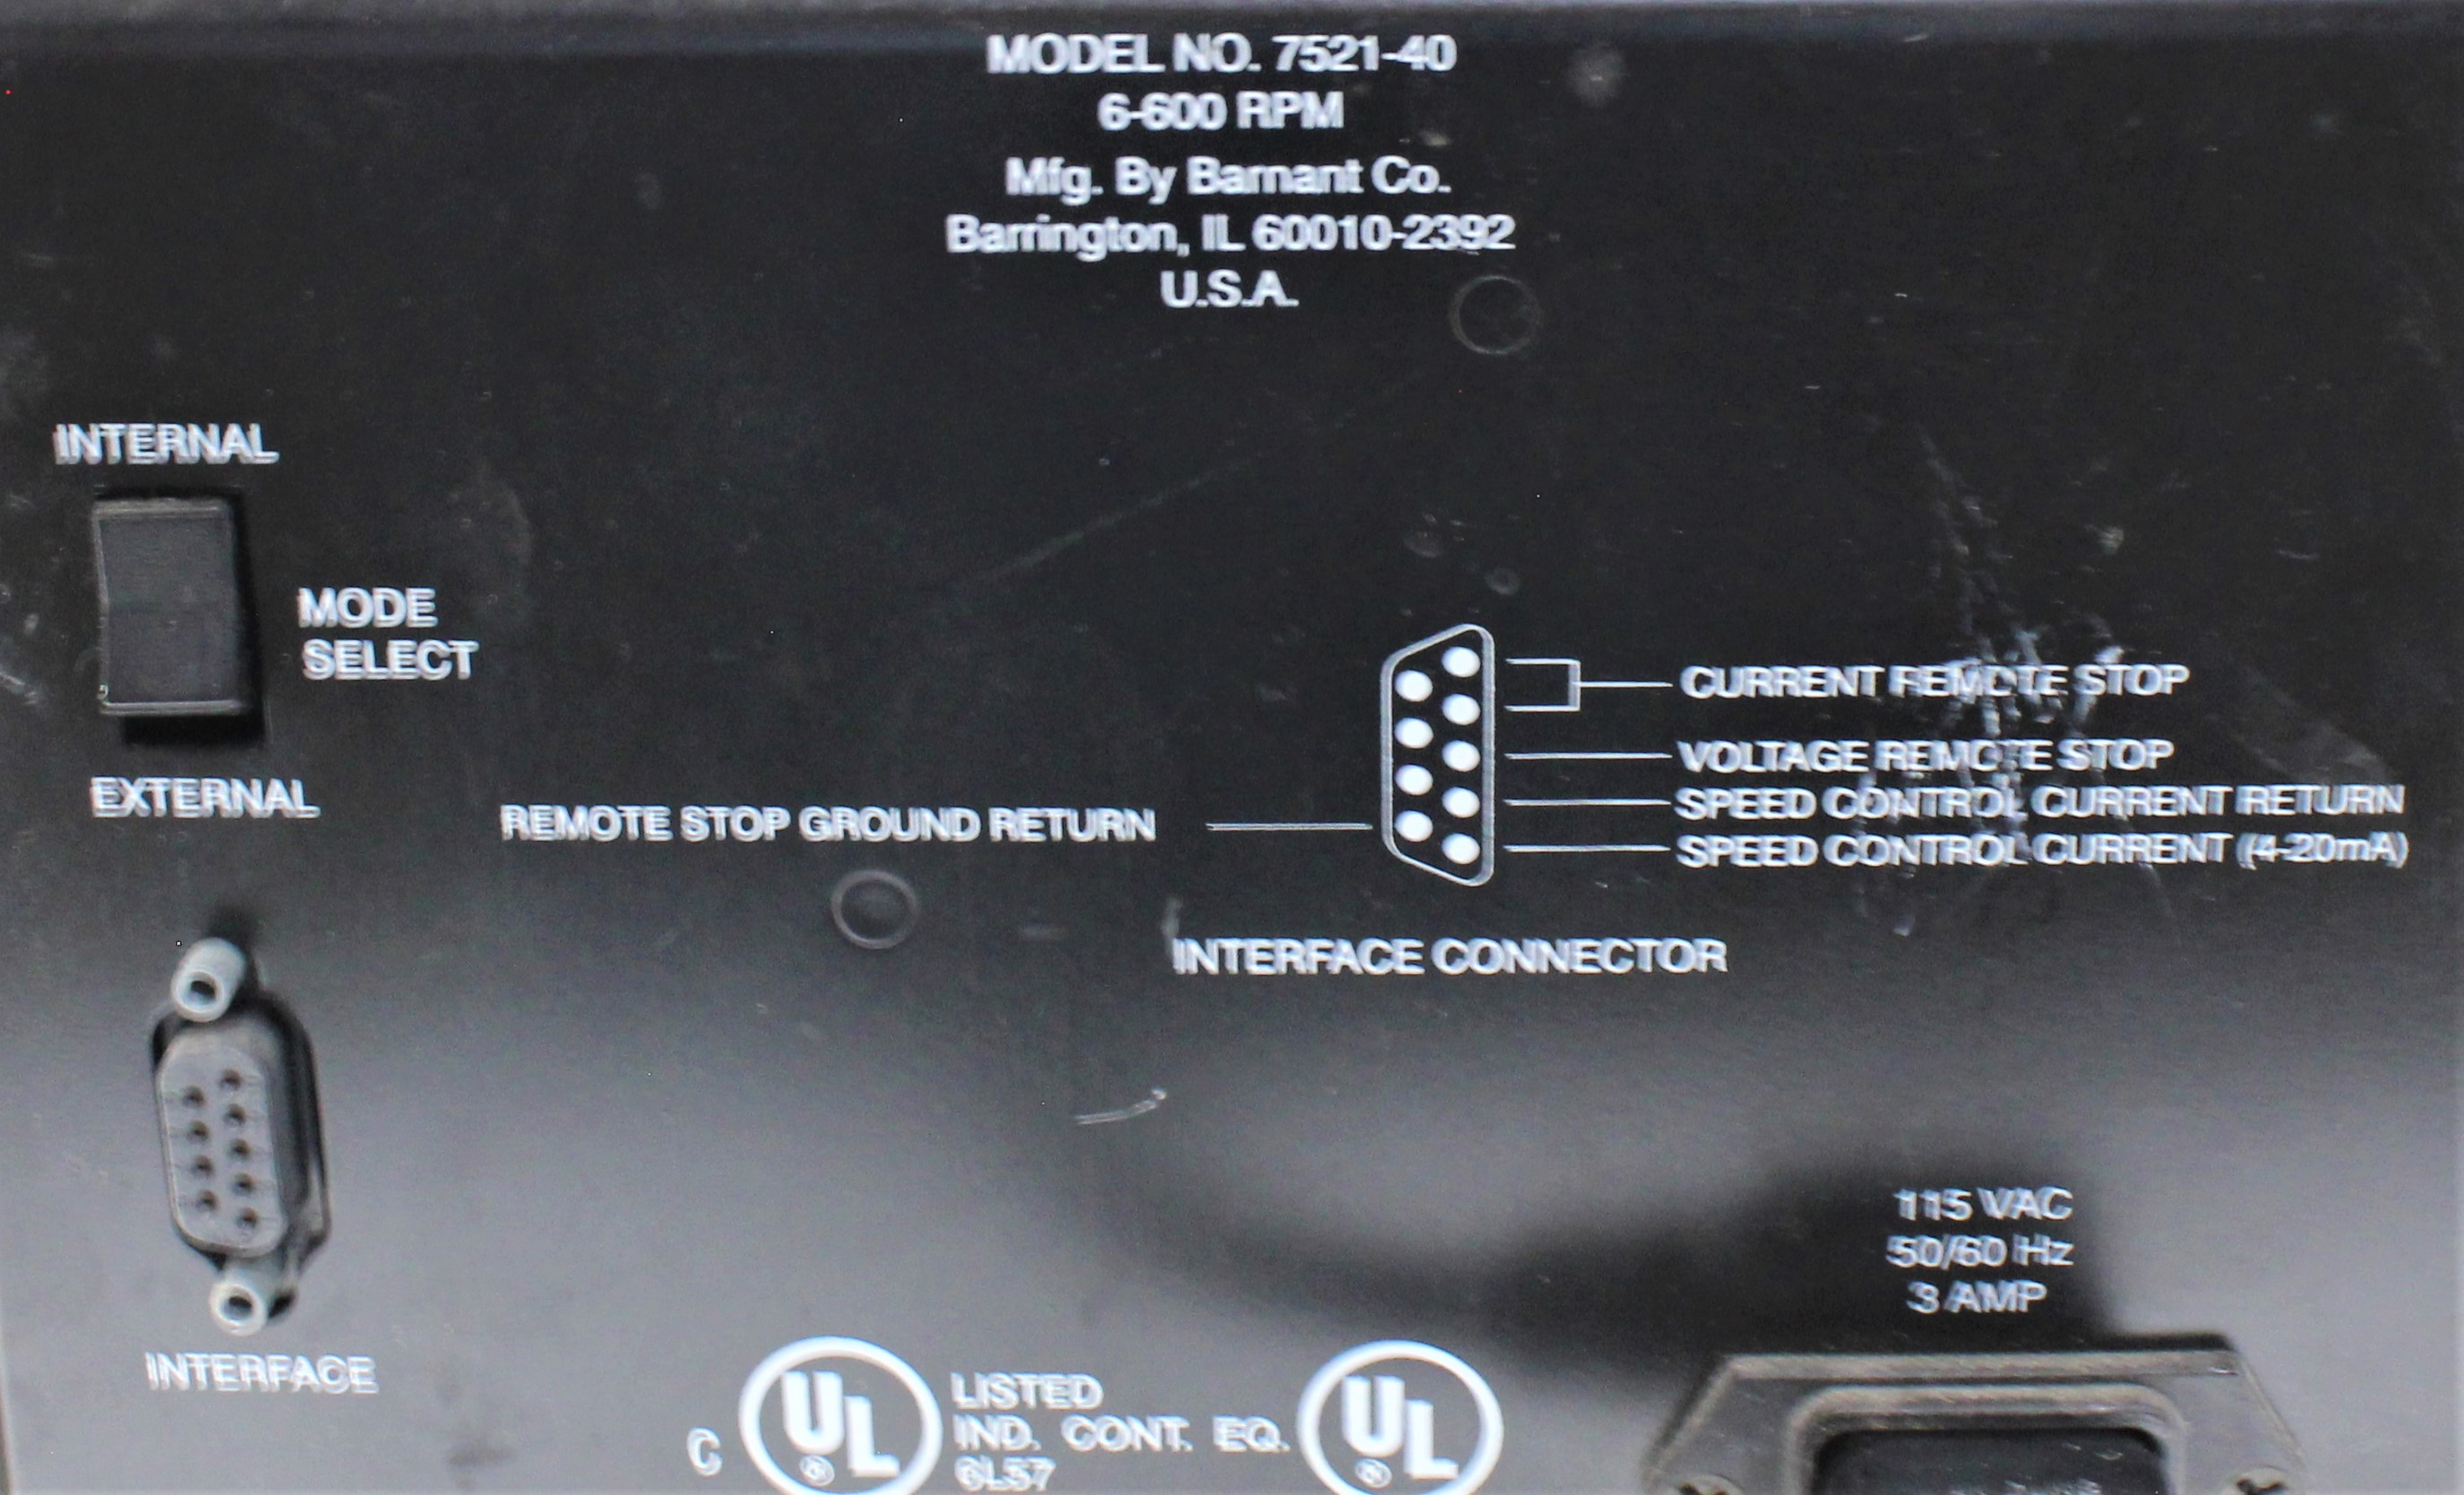 Image COLE PARMER 7521-40 Masterflex Peristaltic Pump 1586990